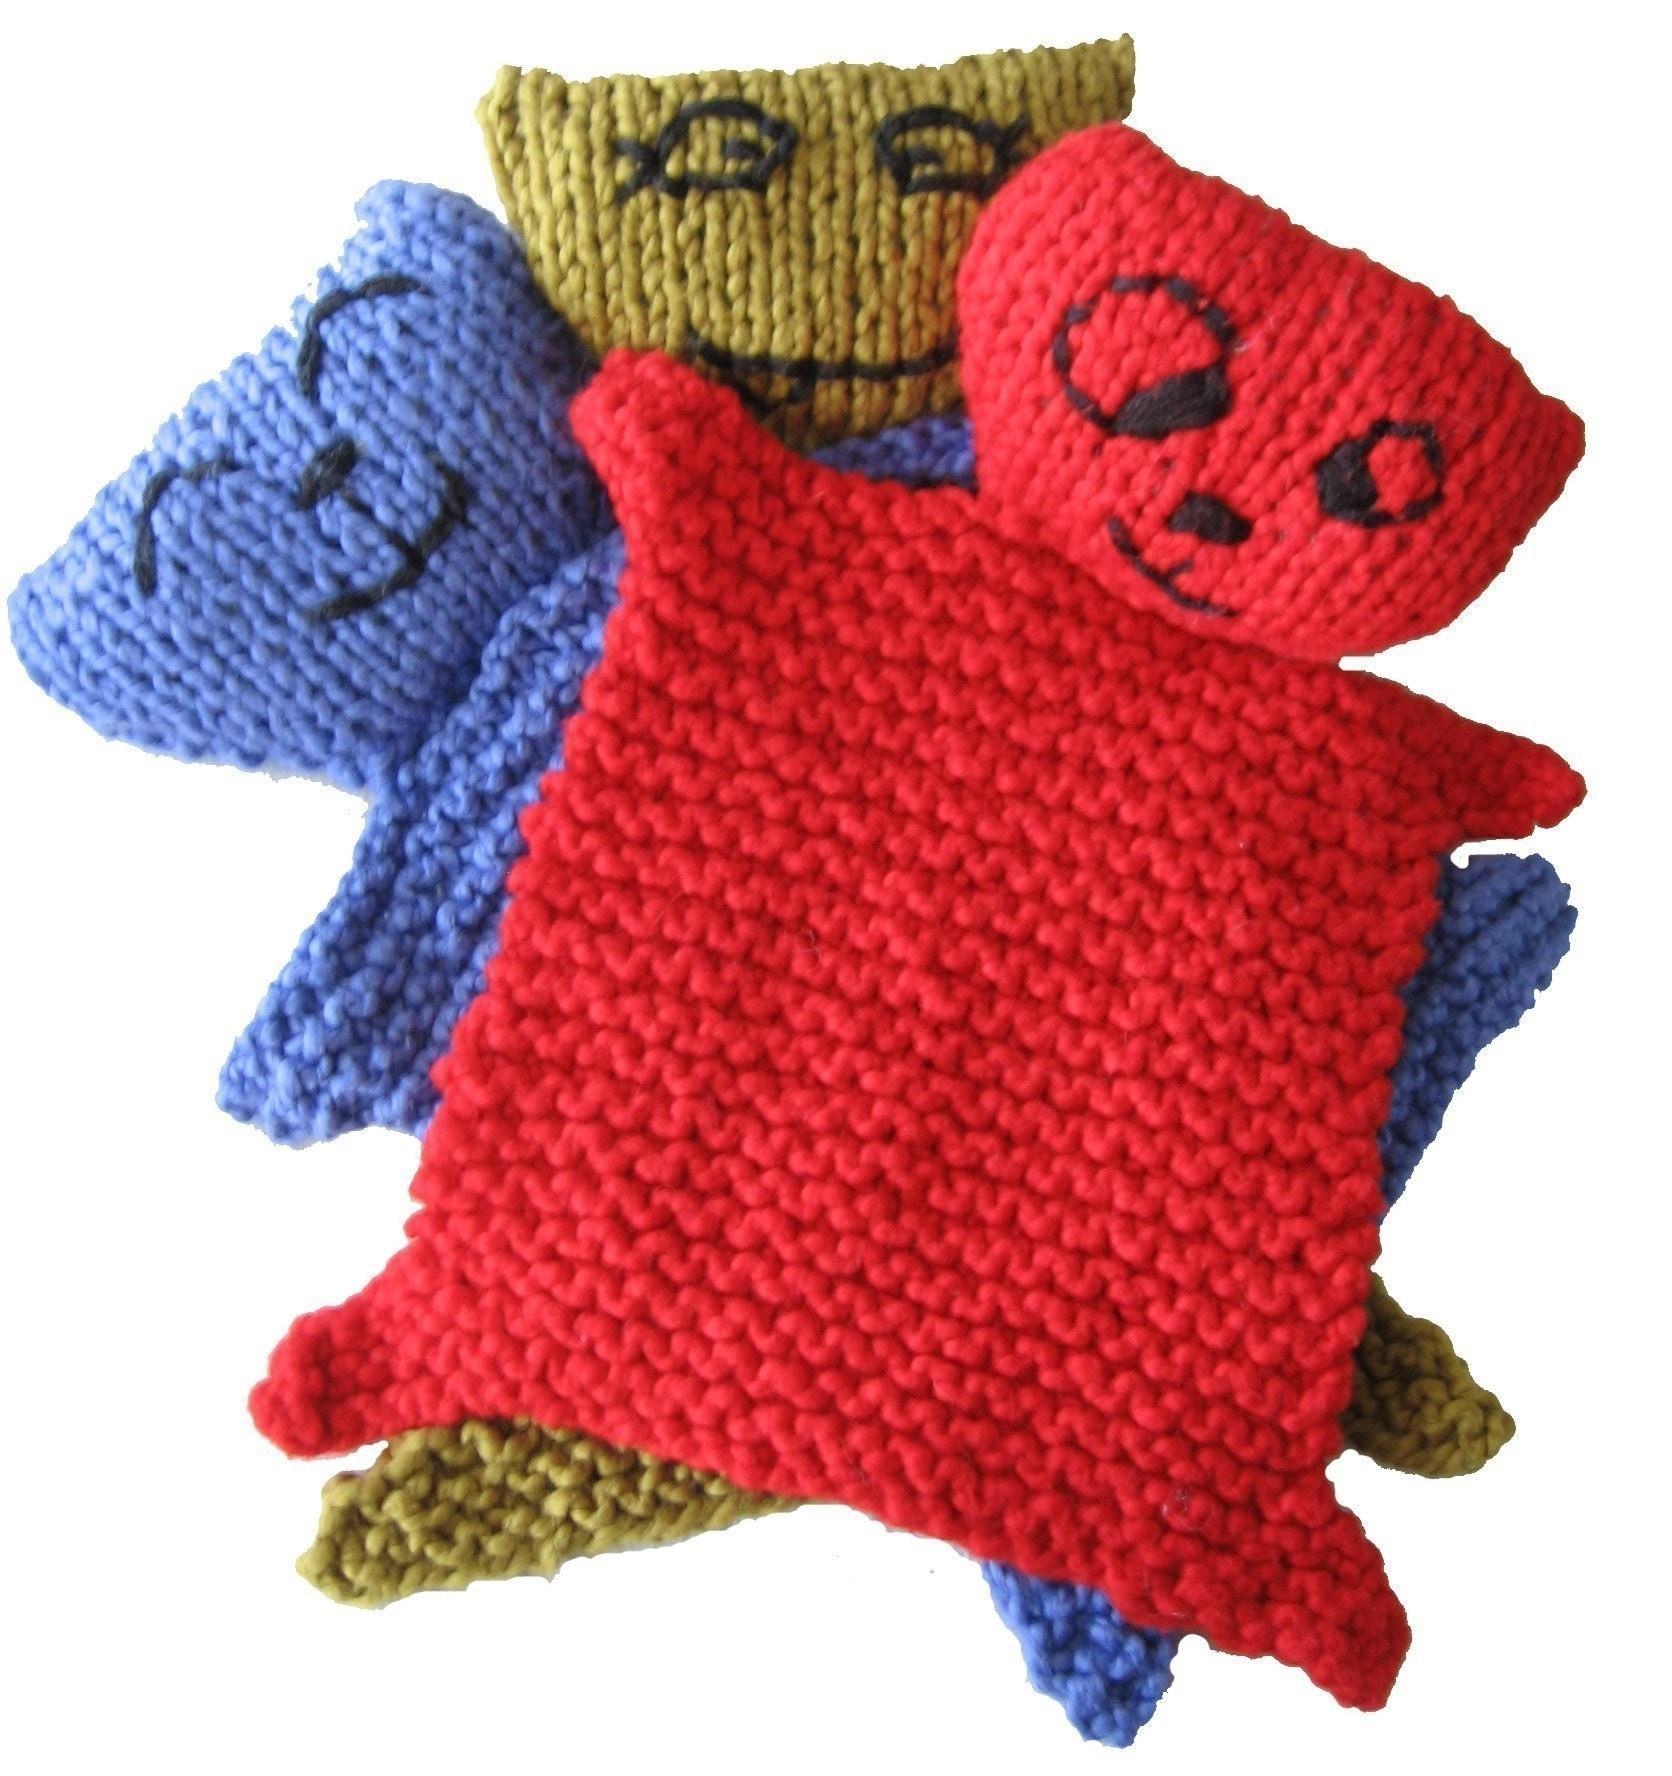 Free Knitting Patterns for Babies: 9 Free Baby Knitting Patterns